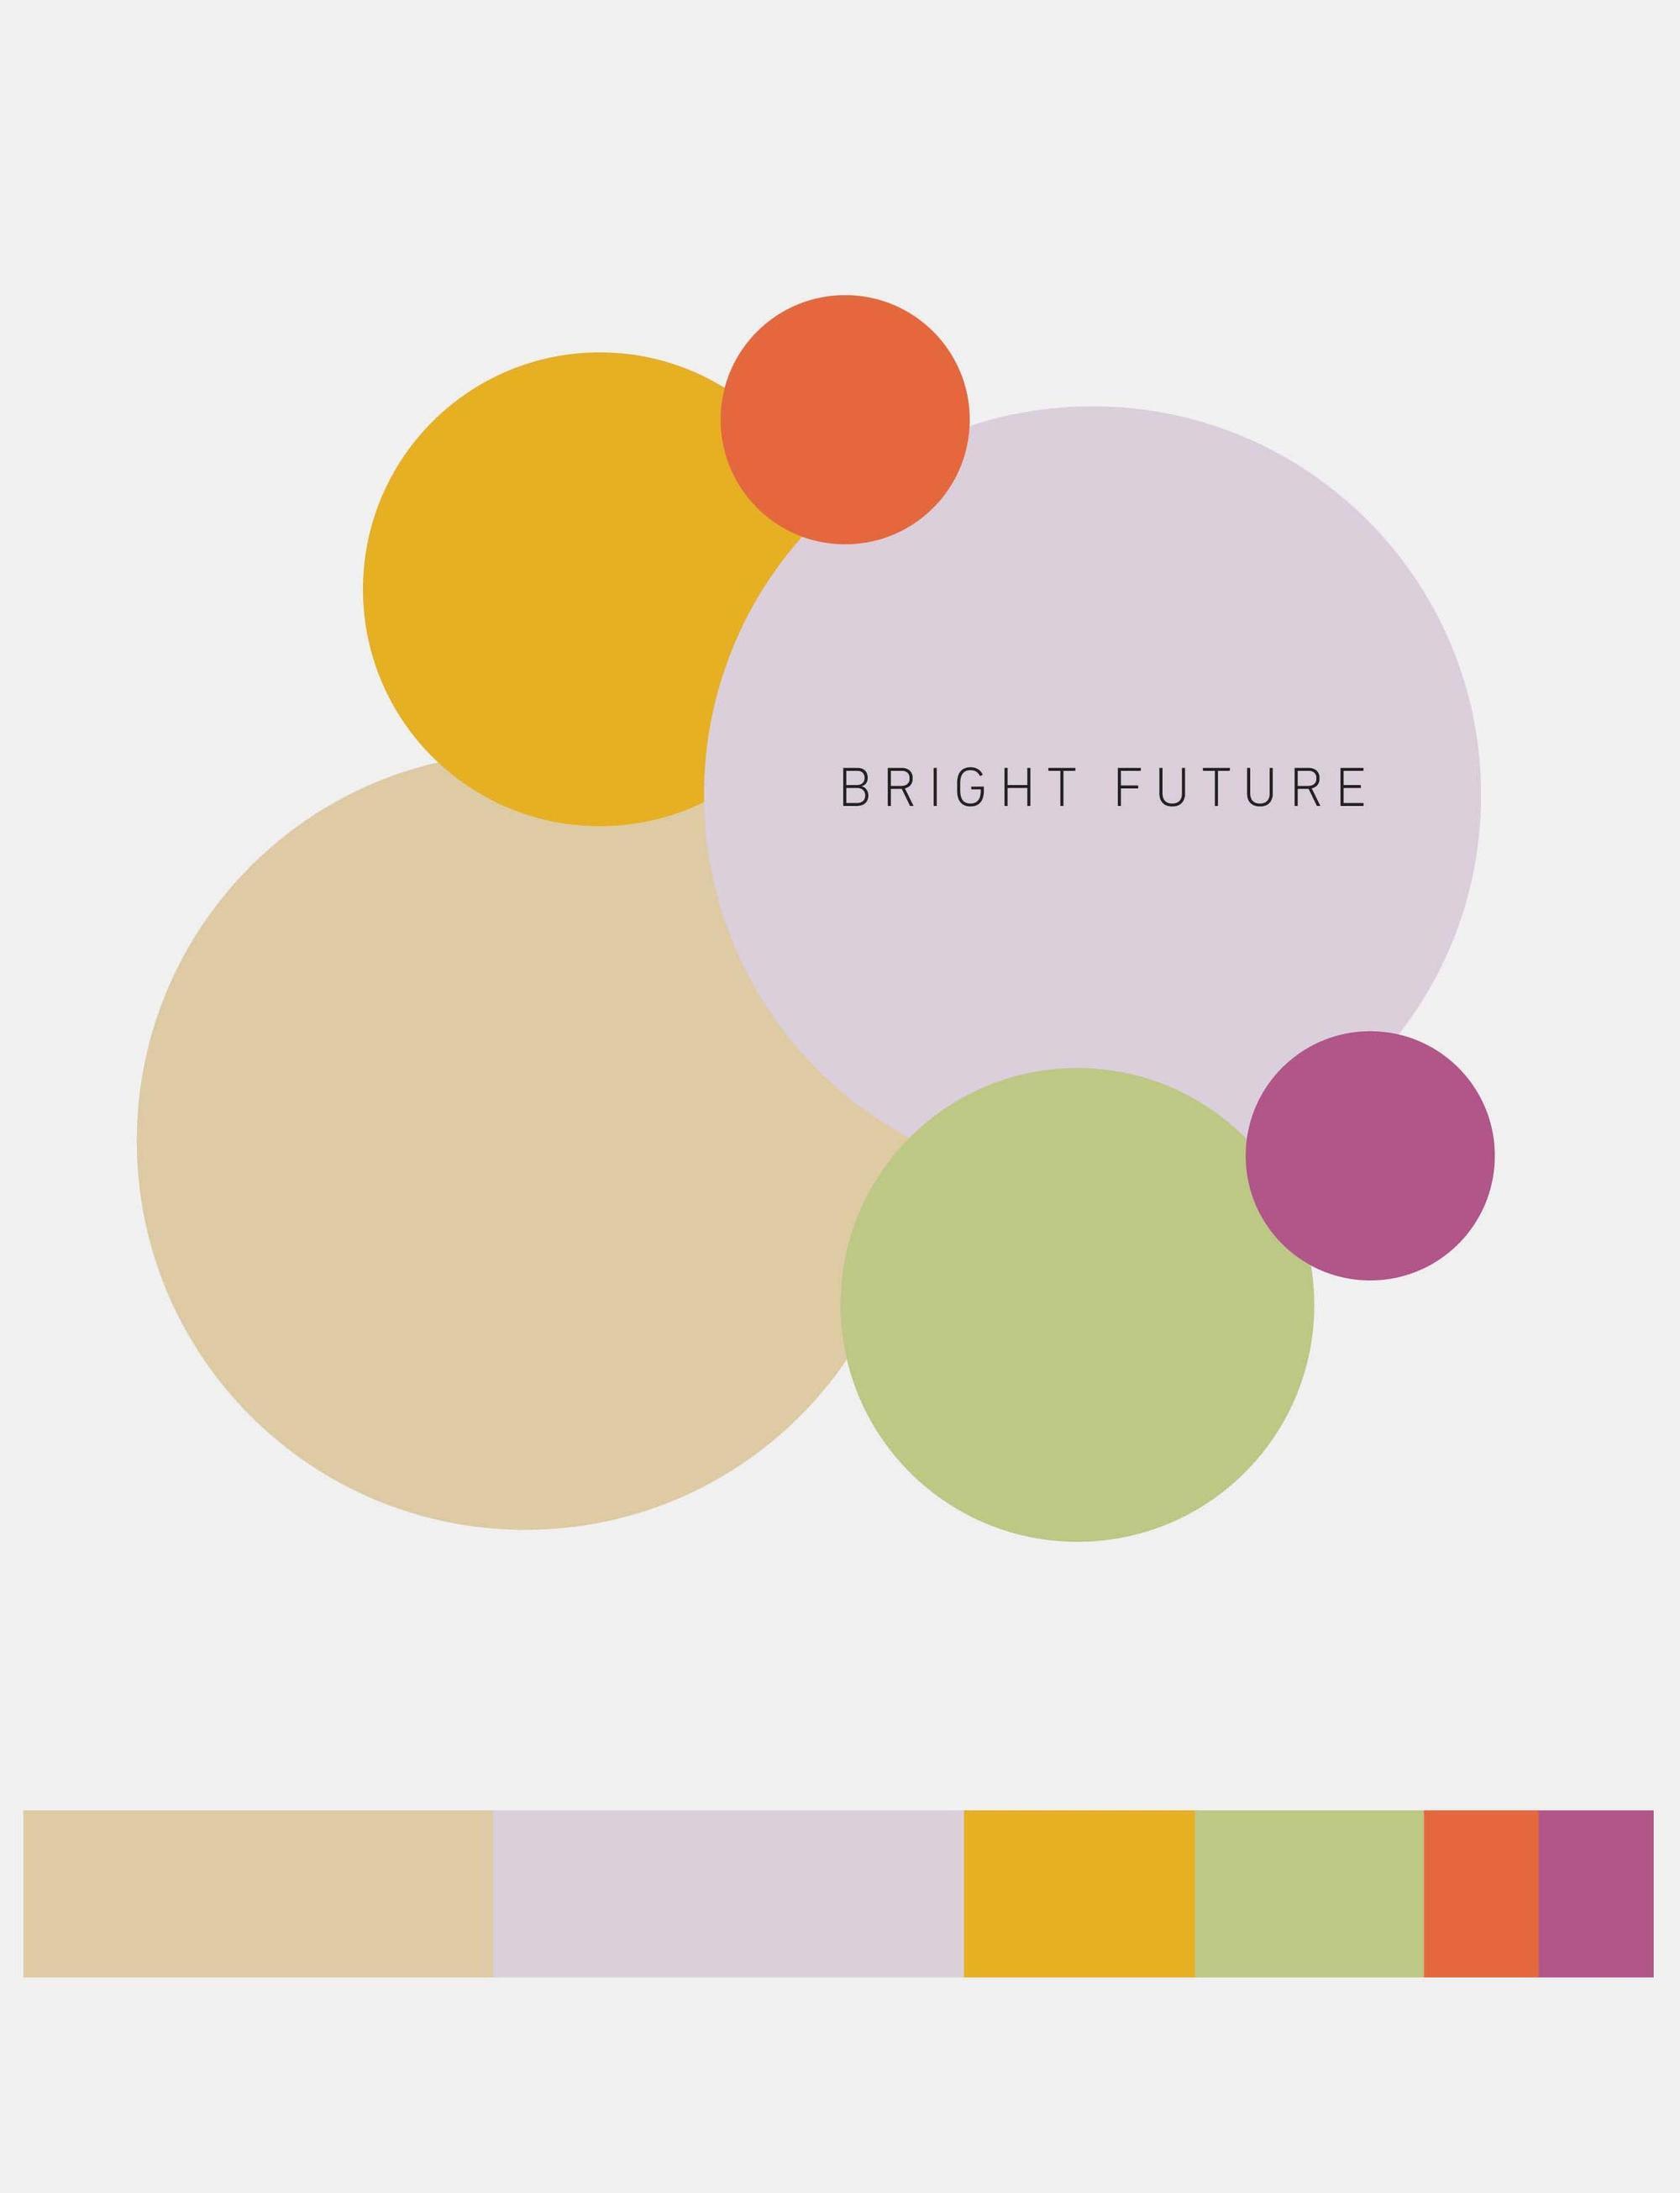 BrightFutures_Colour Circels.jpg